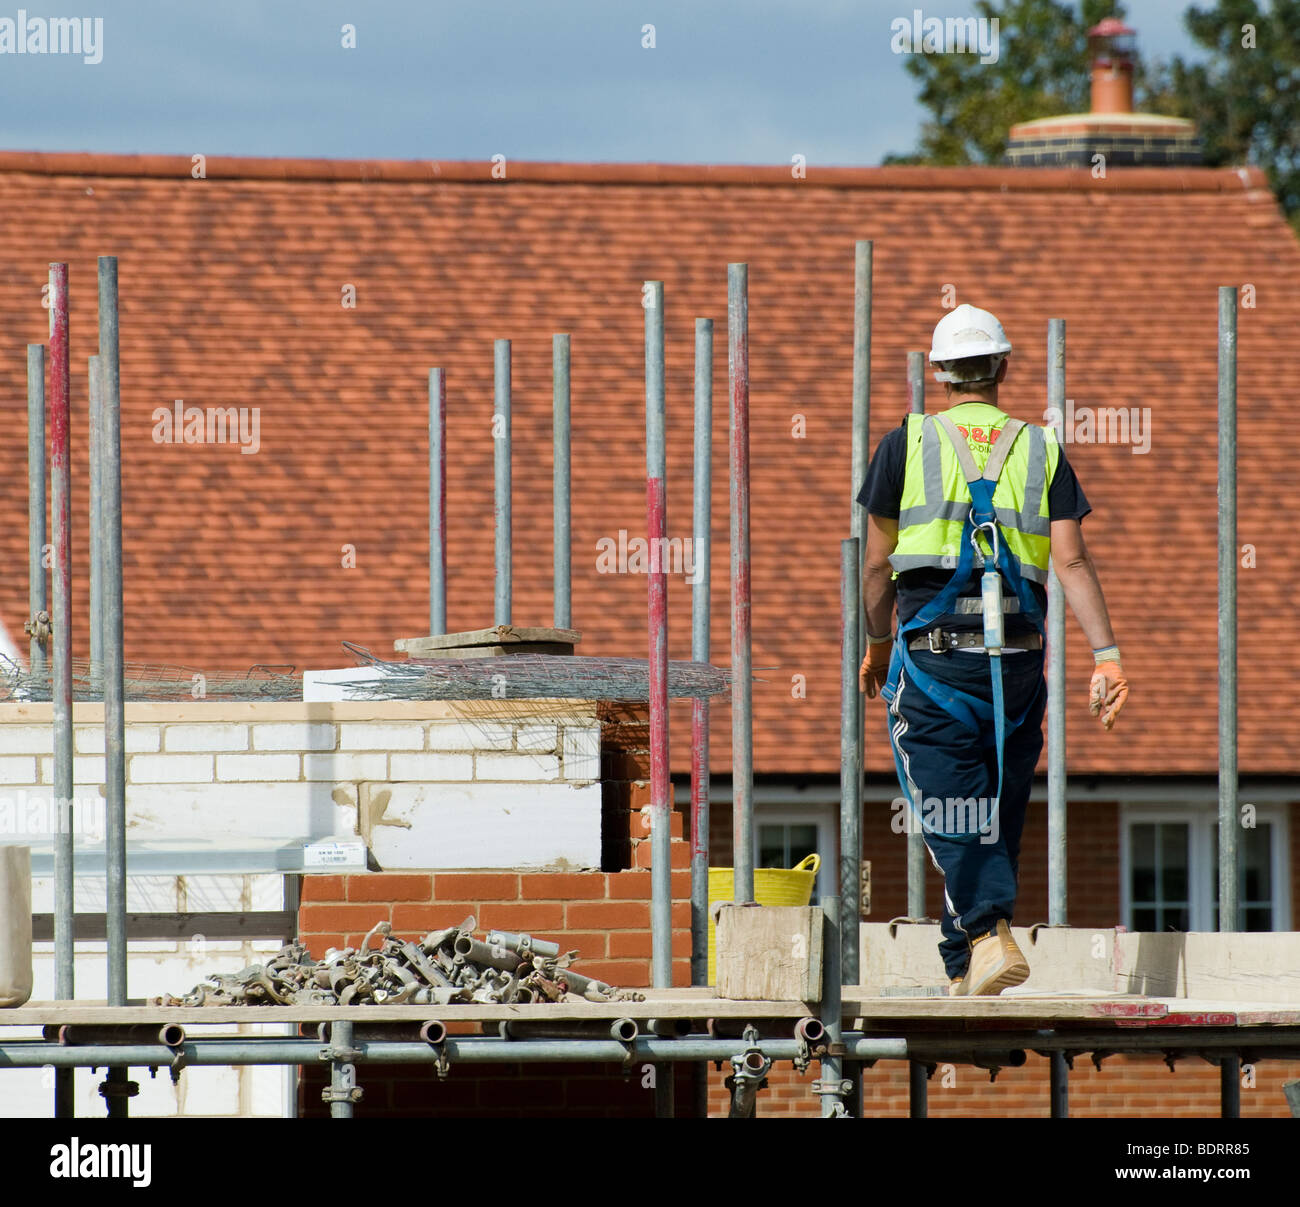 Construction site worker walking across scaffolding platform. - Stock Image